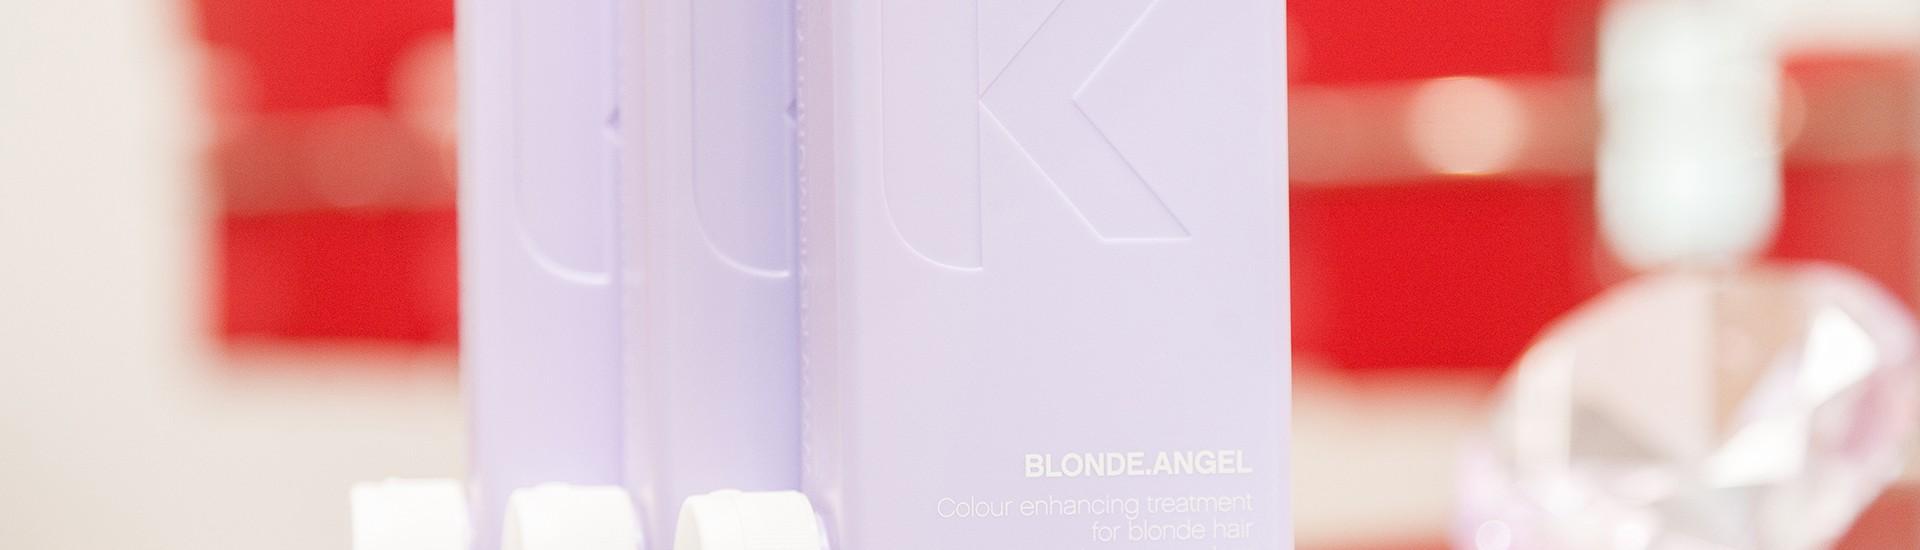 Kbal-hairstylist-Kapsalon-Amsterdam-Kevin-Murphy-blonde-angel